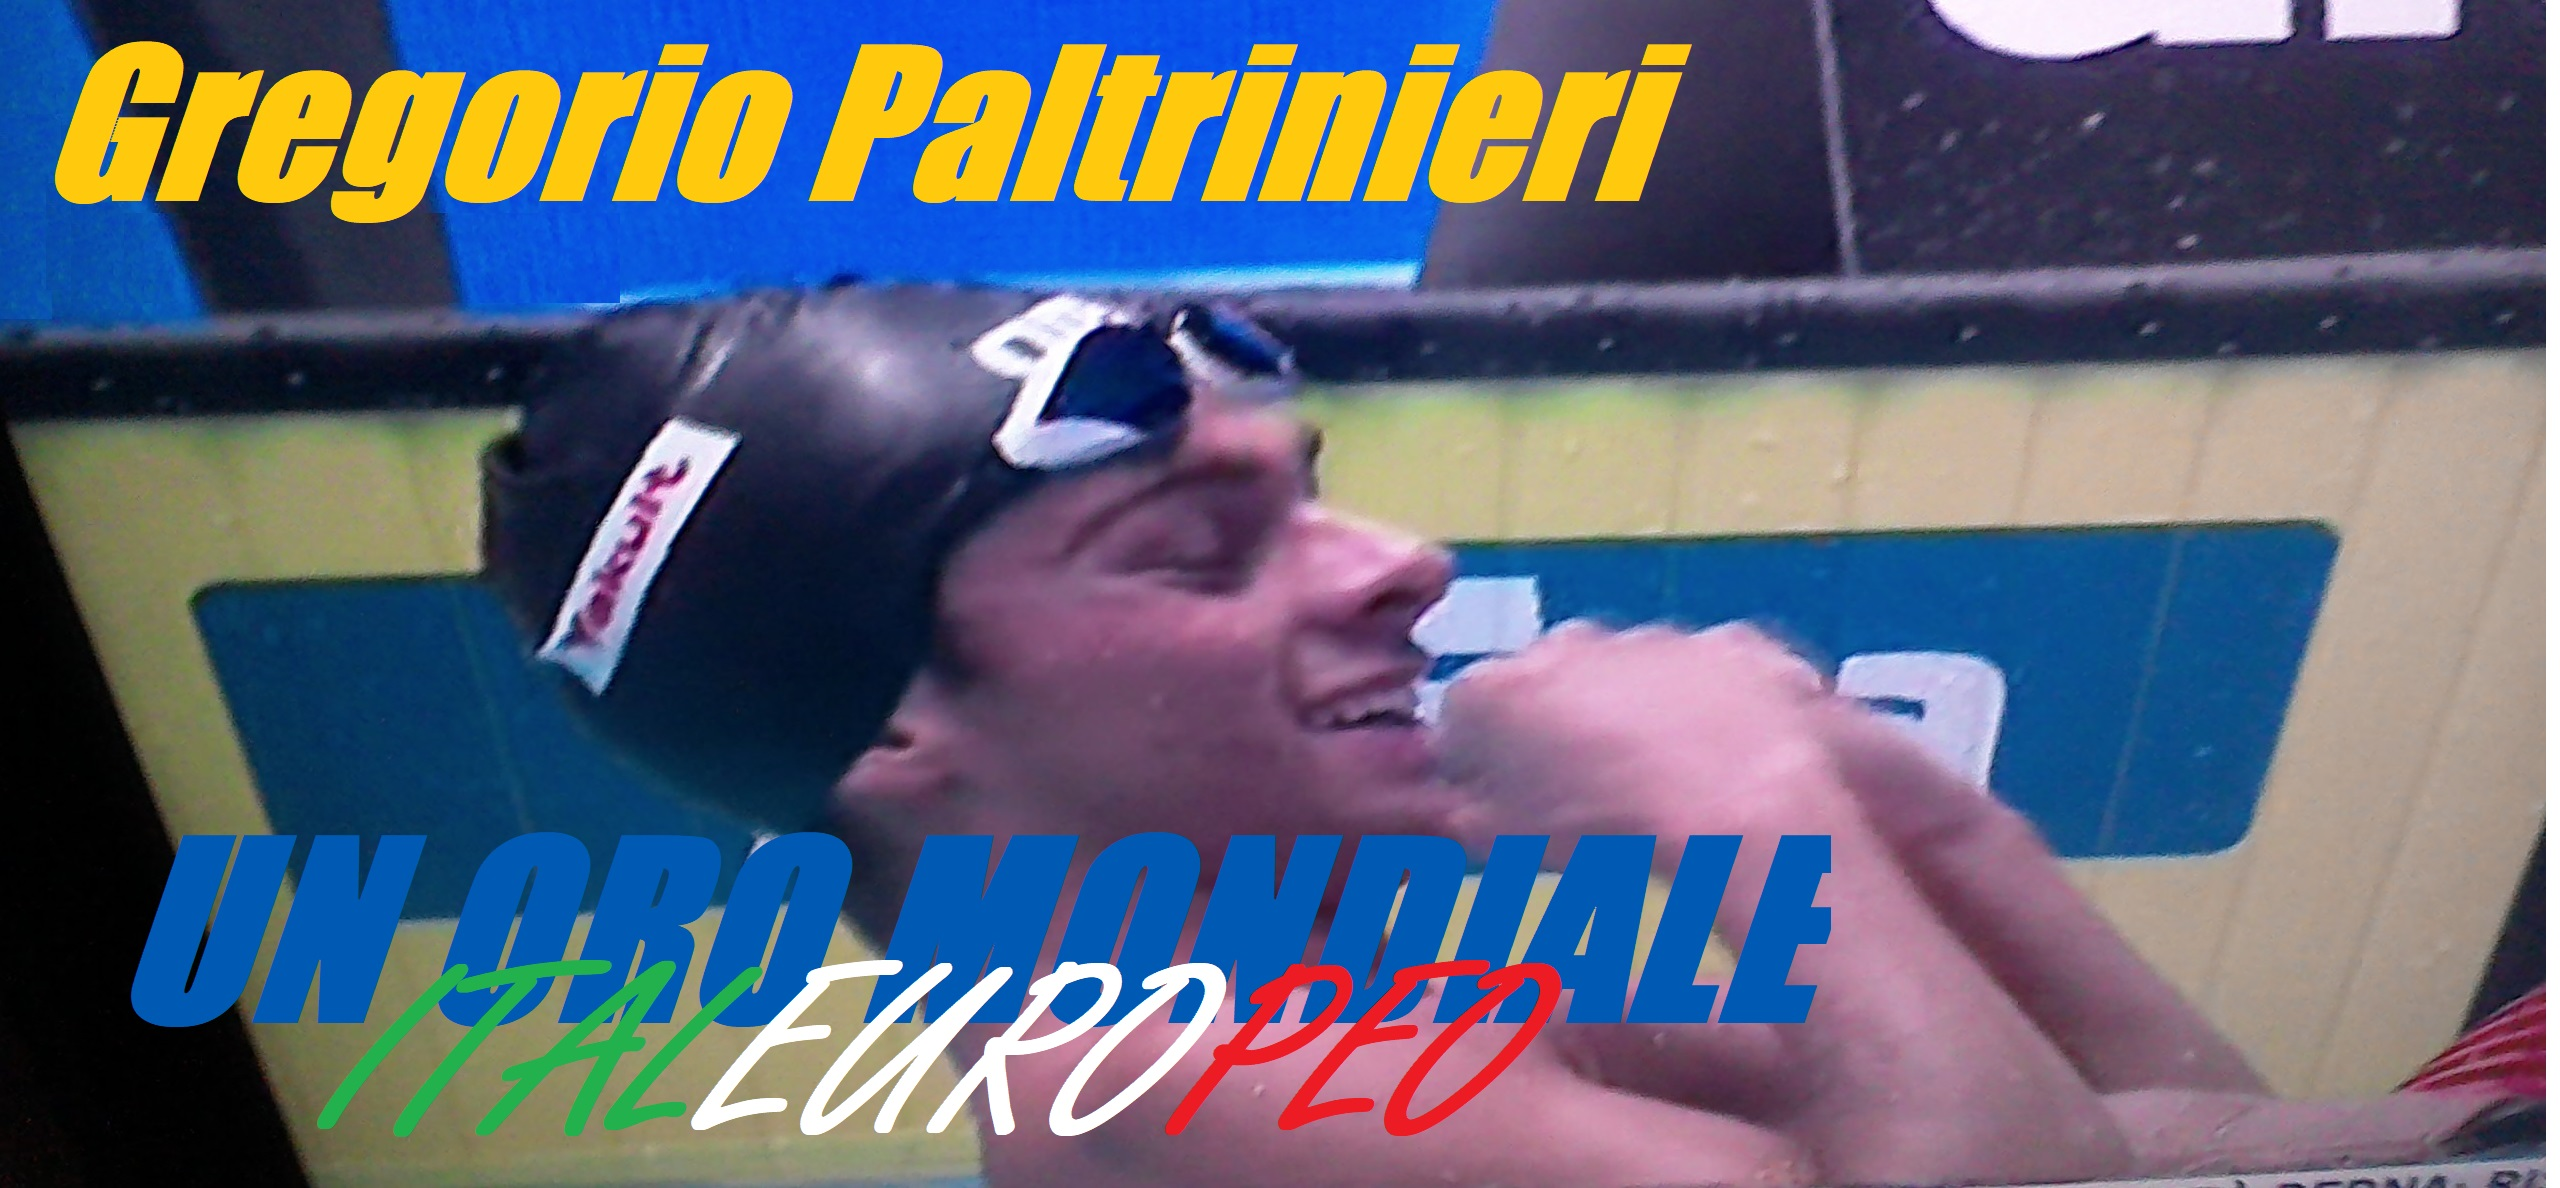 "GREGORIO PALTRINIERI UN ORO MONDIALE ""ITALEUROPEO"""